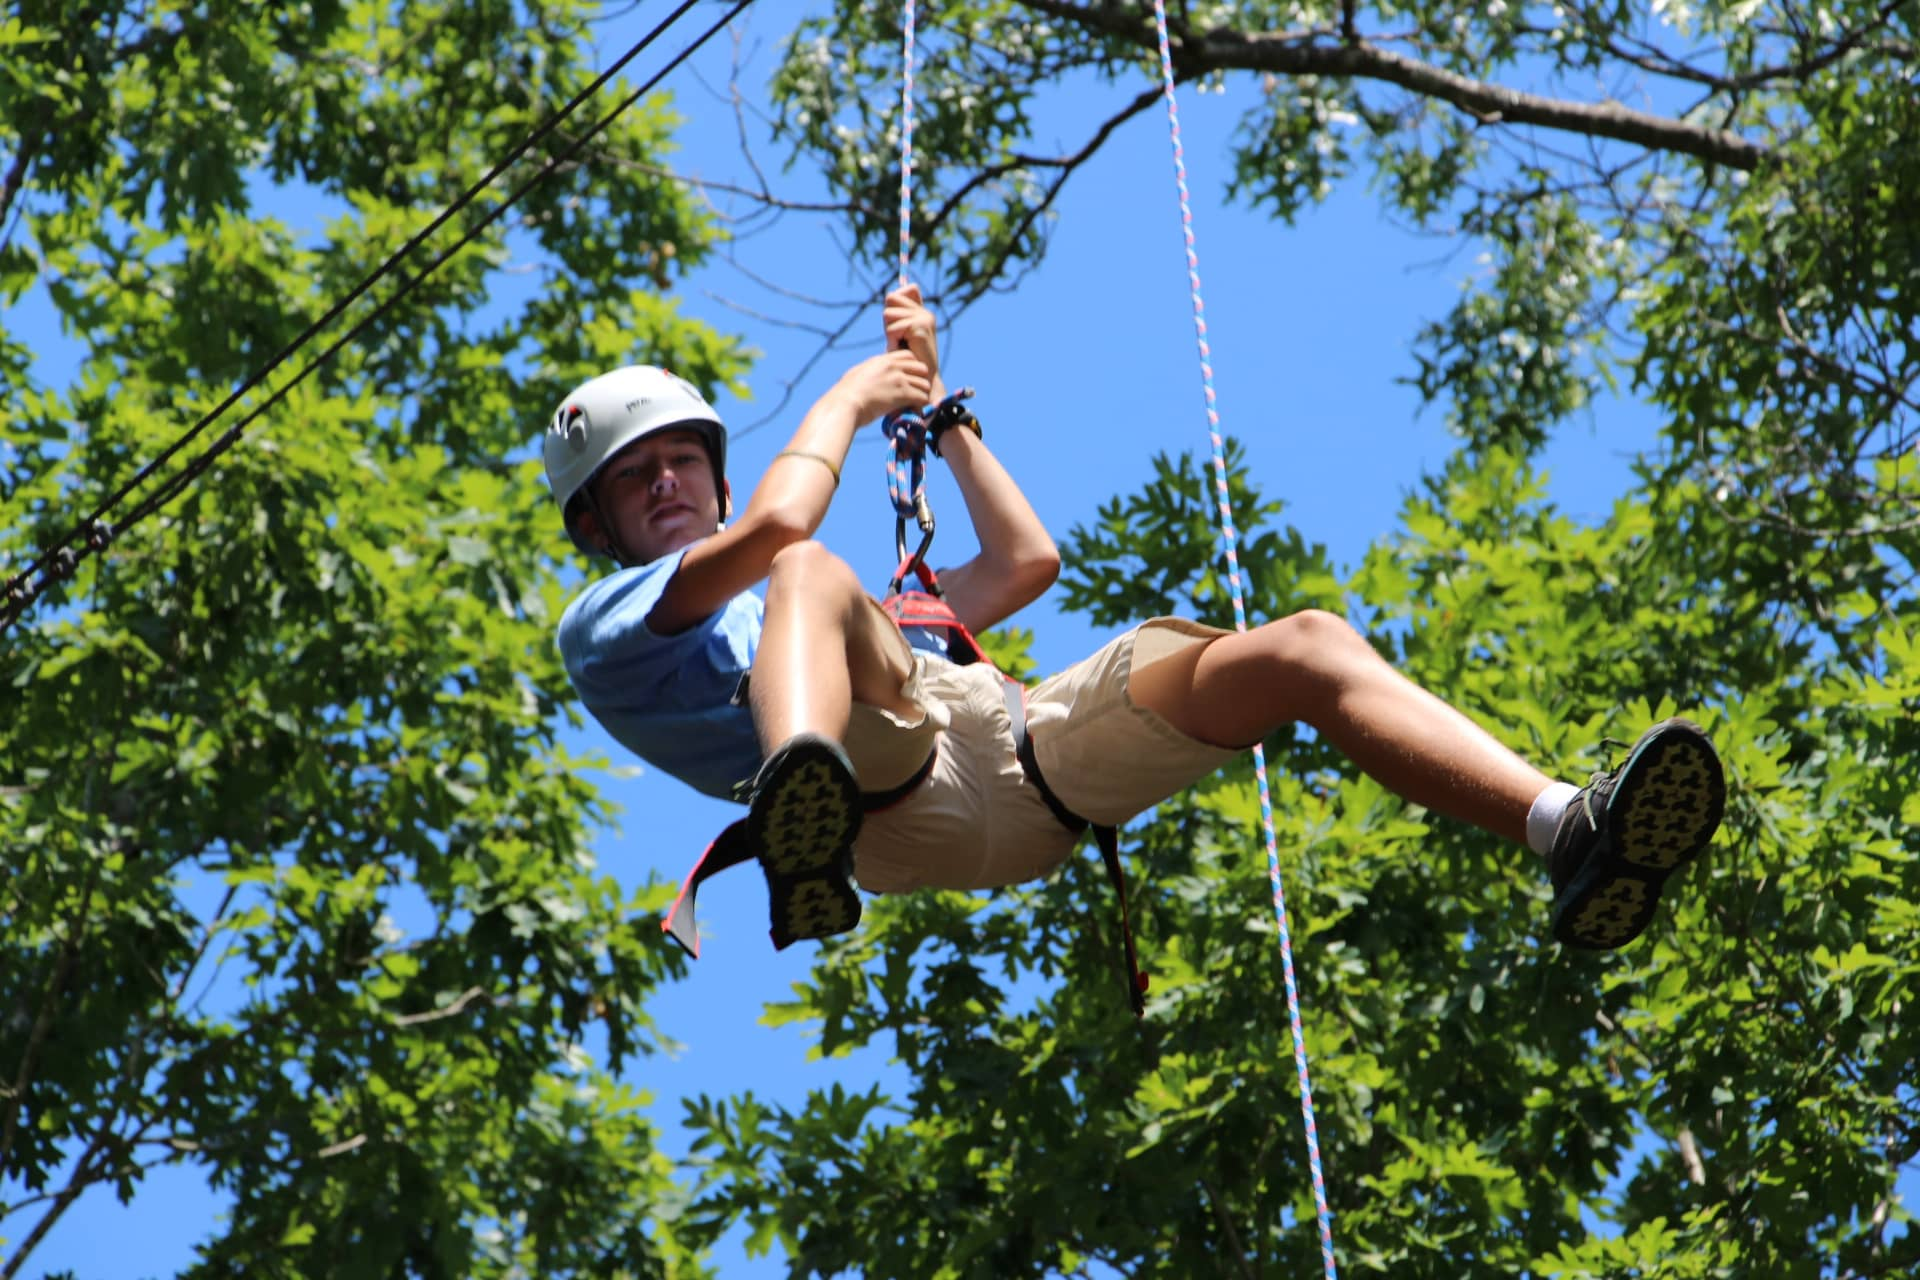 Zip line at summer camp